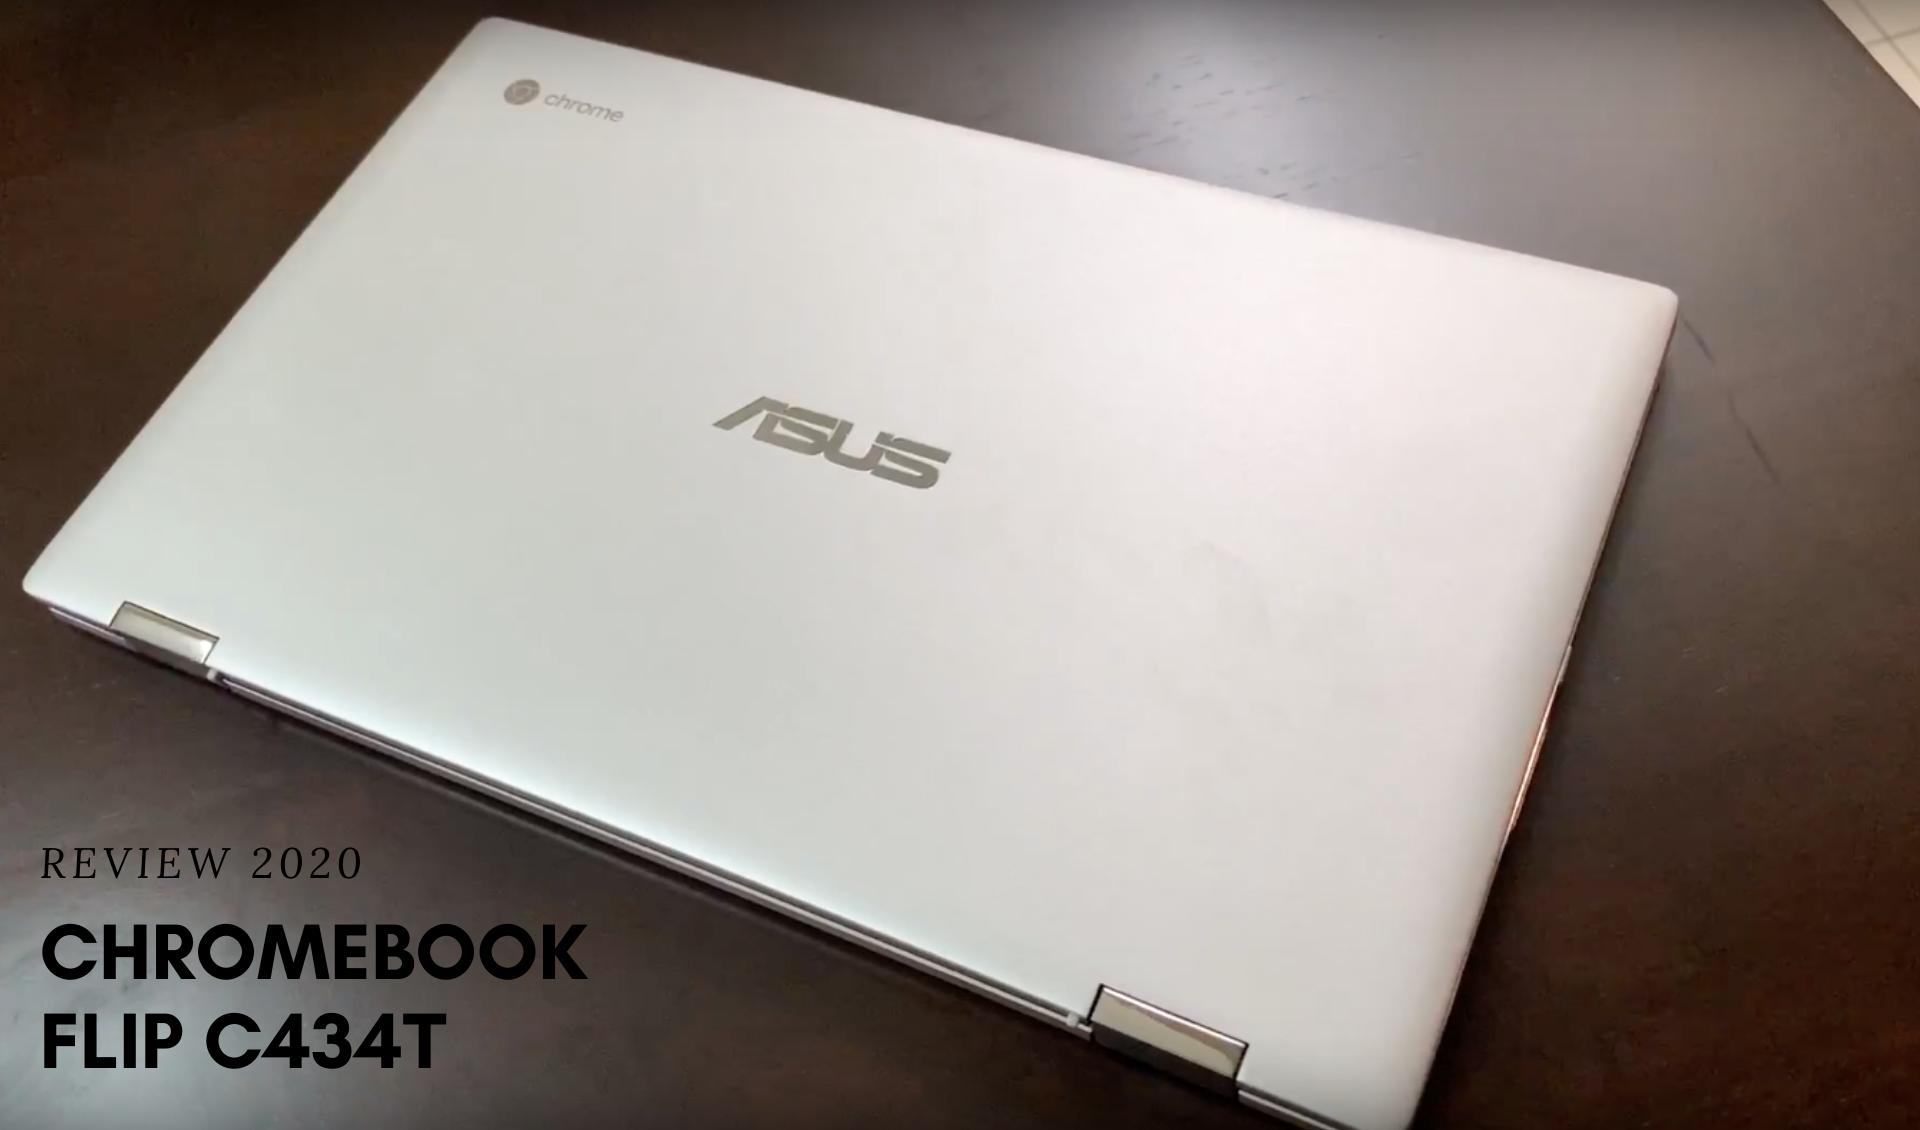 Review Chromebook